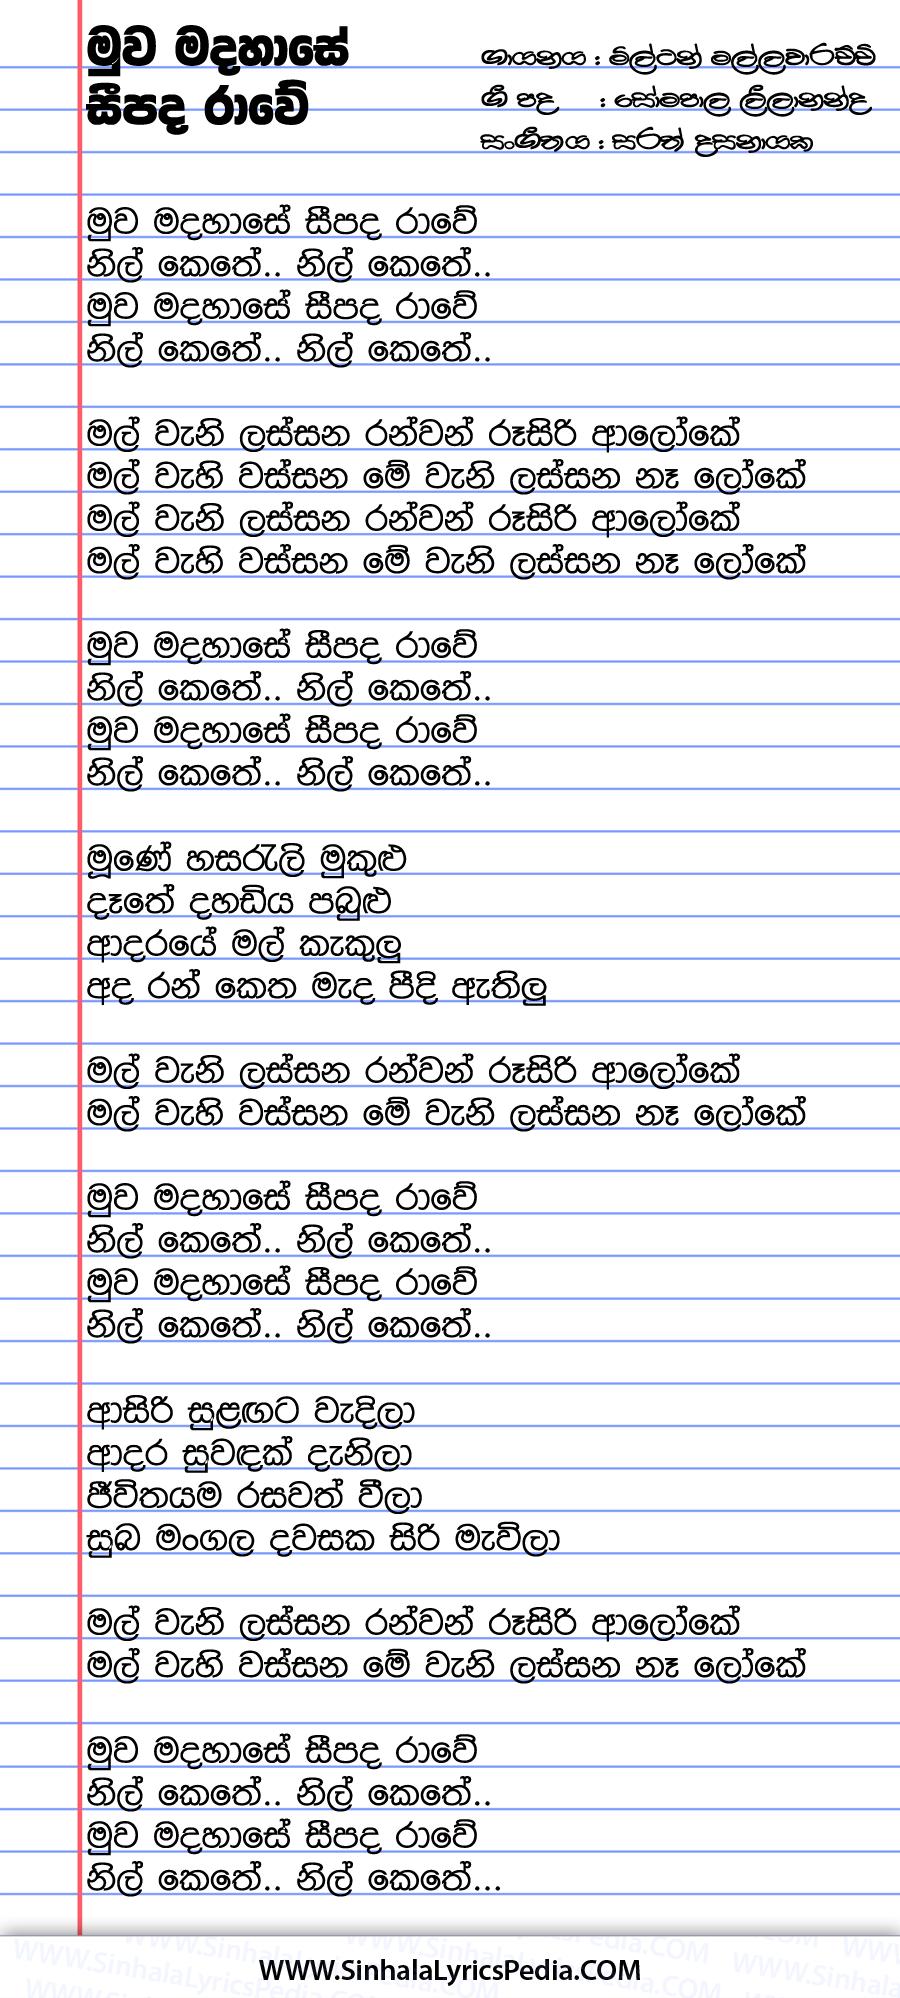 Muwa Madahase Seepada Rawe Song Lyrics